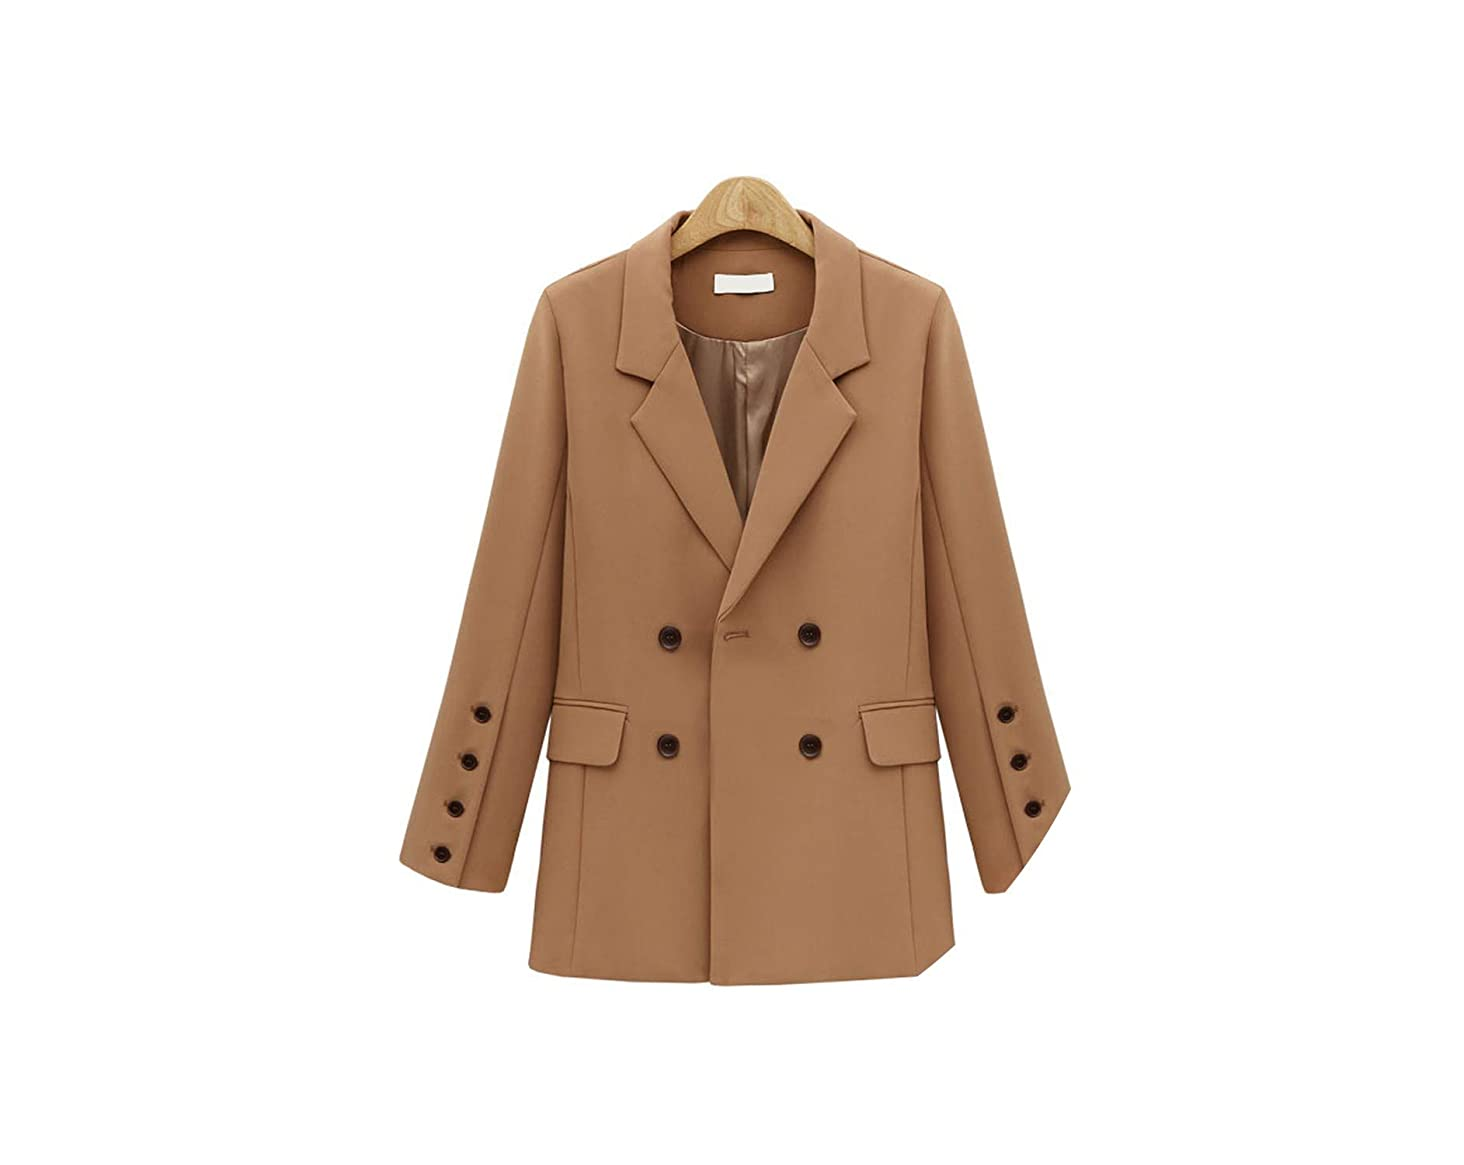 Autumn Winter Suit Blazer Women Breasted Pocket Women Jackets Elegant Blazer Outerwear